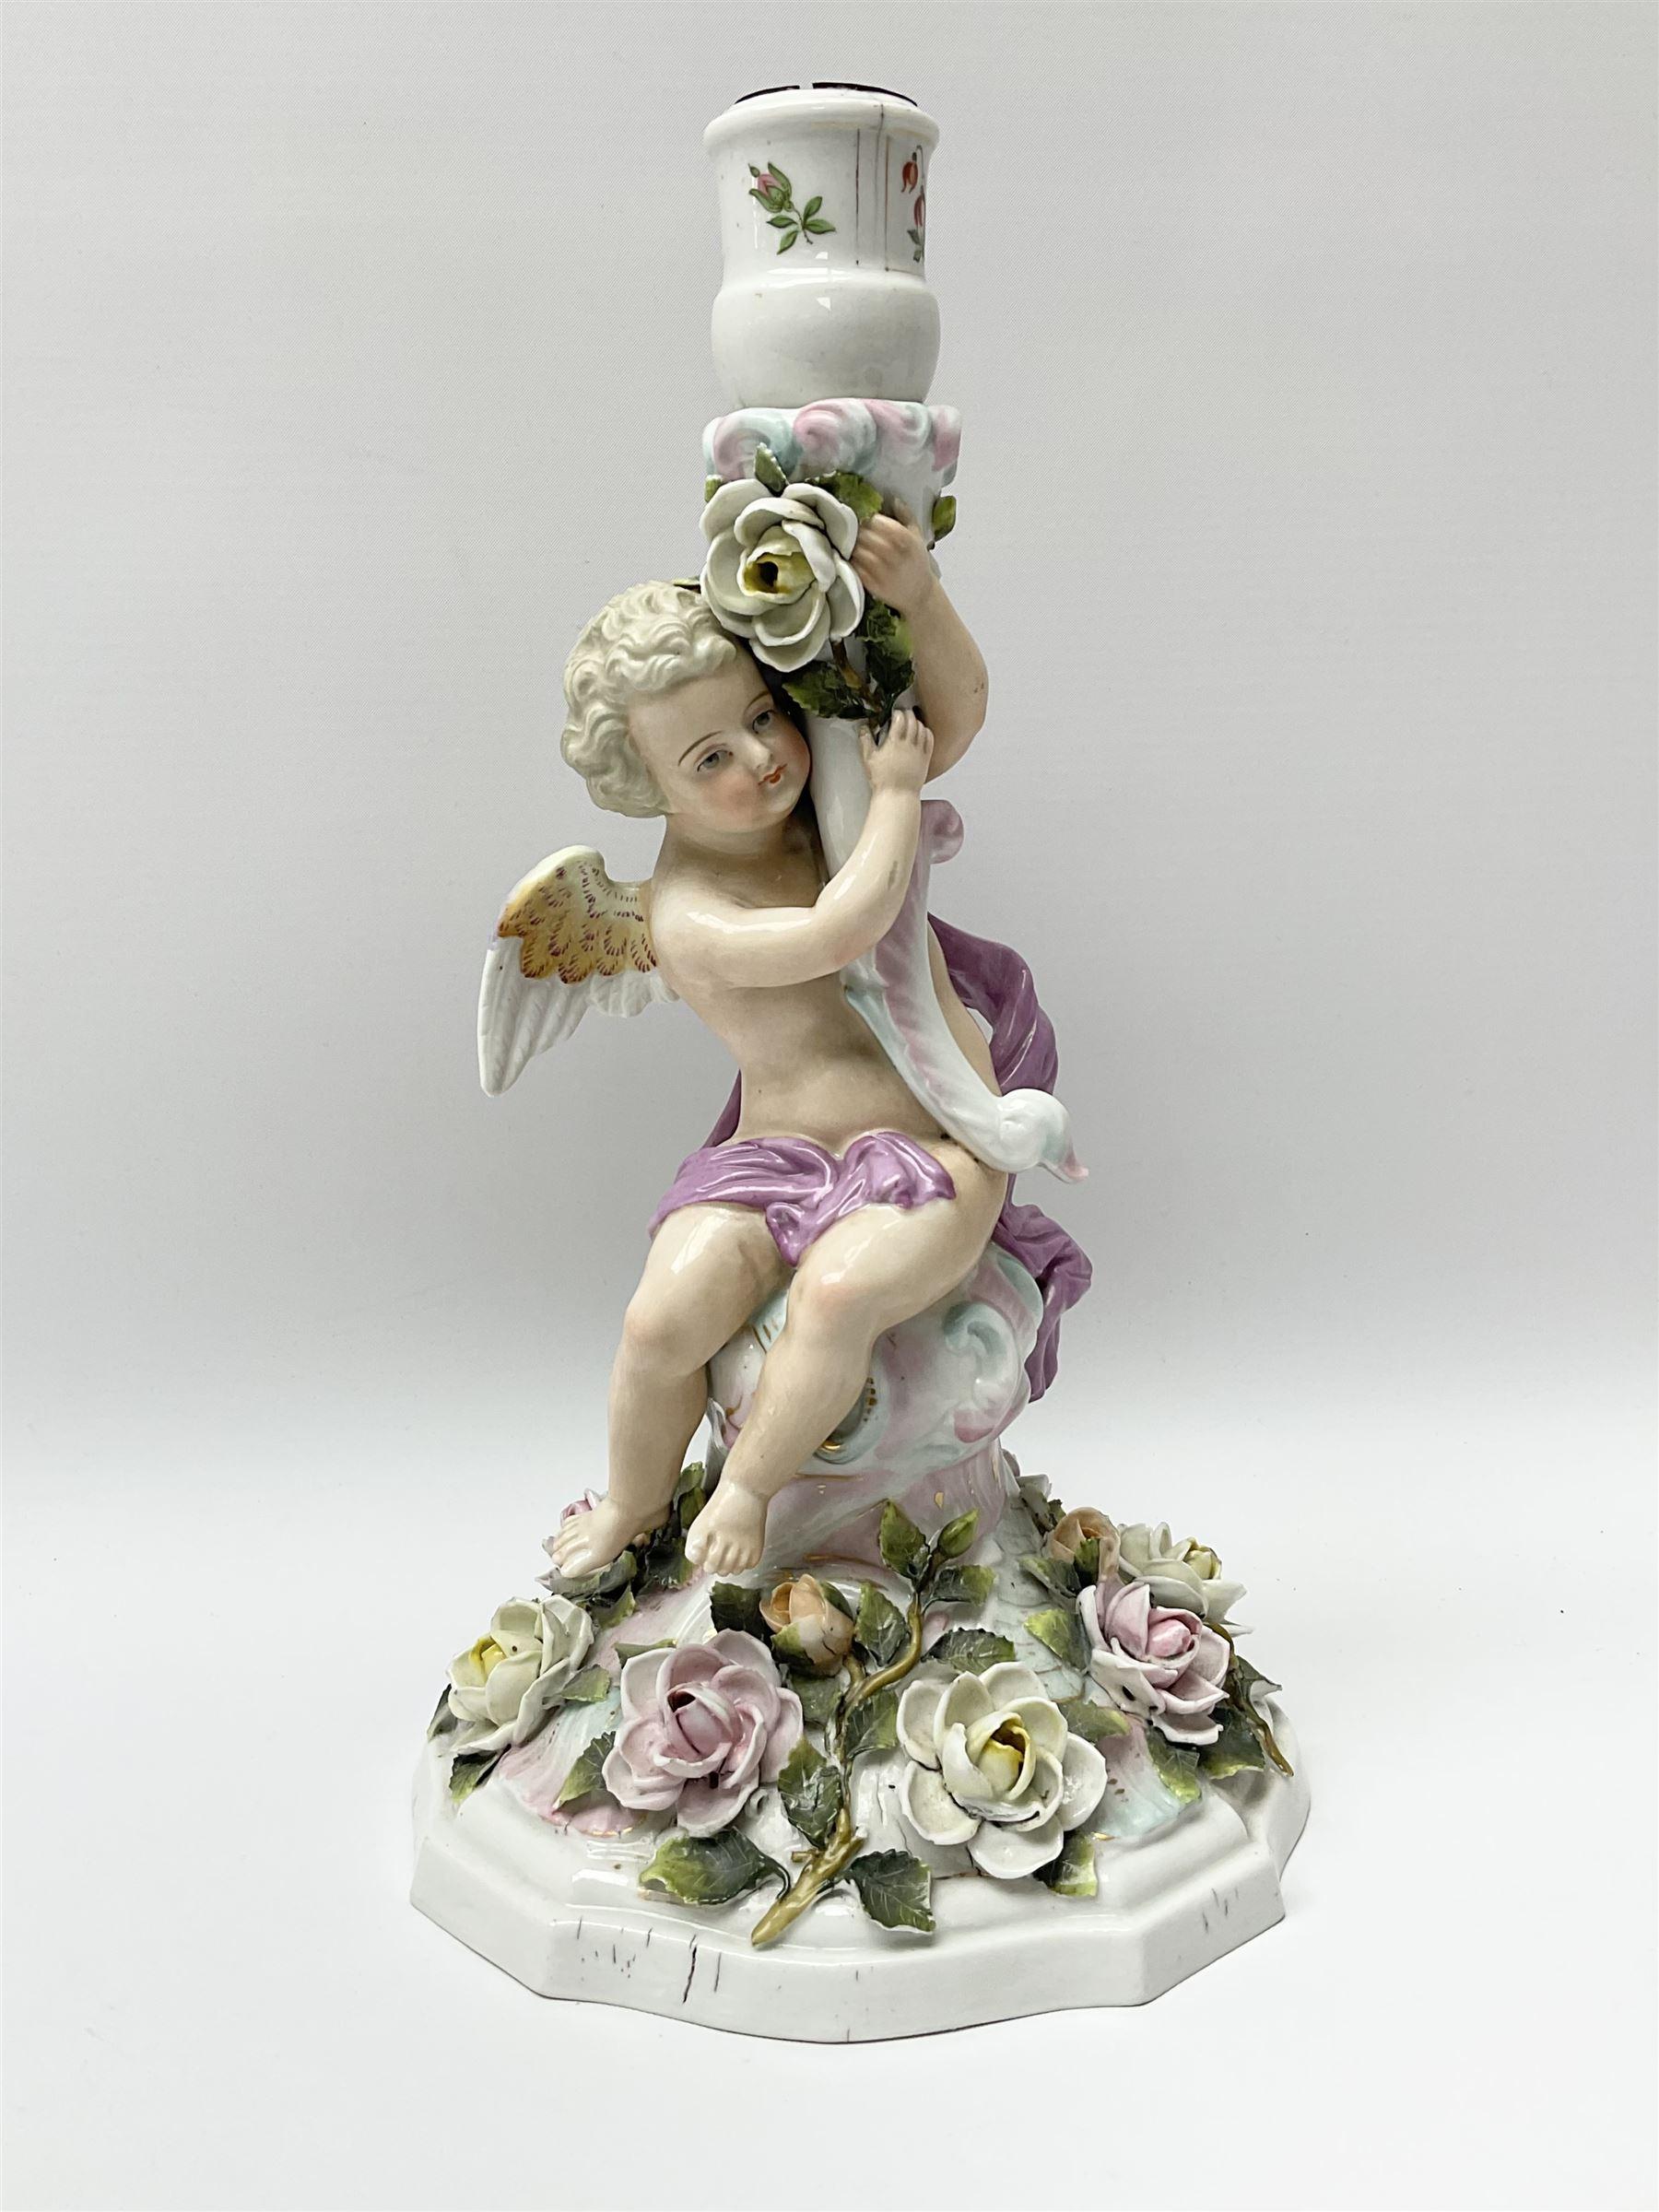 A late 19th century Sitzendorf figural candlestick